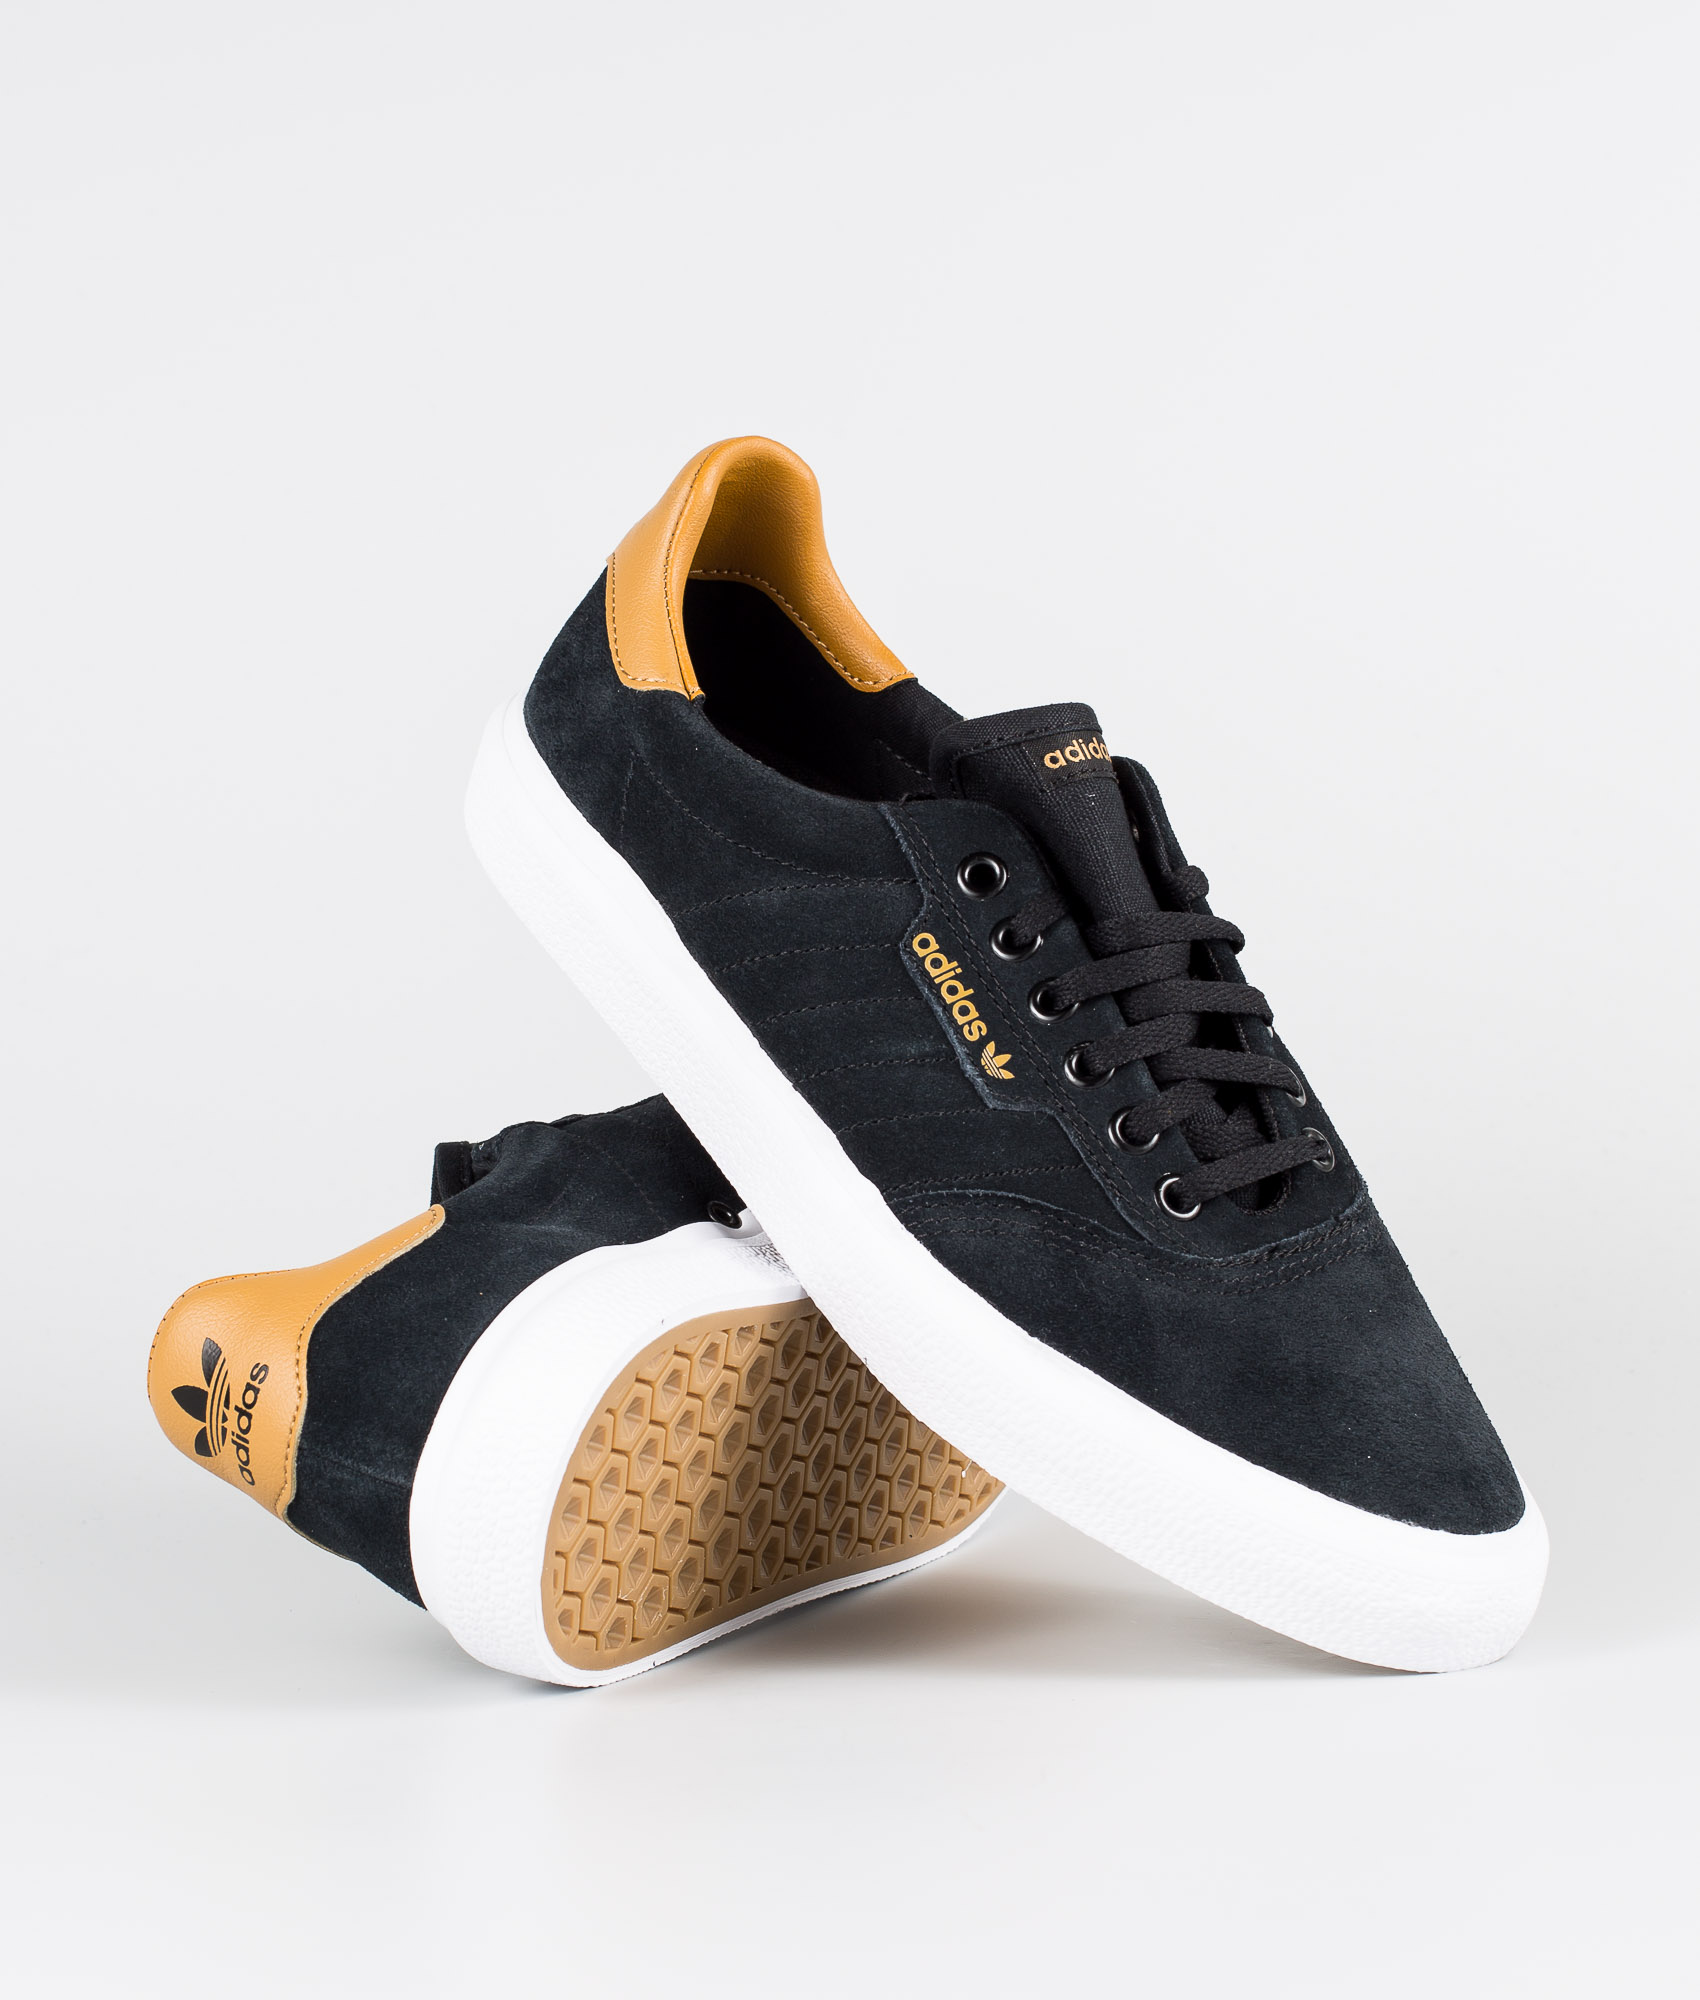 Adidas Skateboarding 3mc Chaussures Core BlackMesaFtwr White